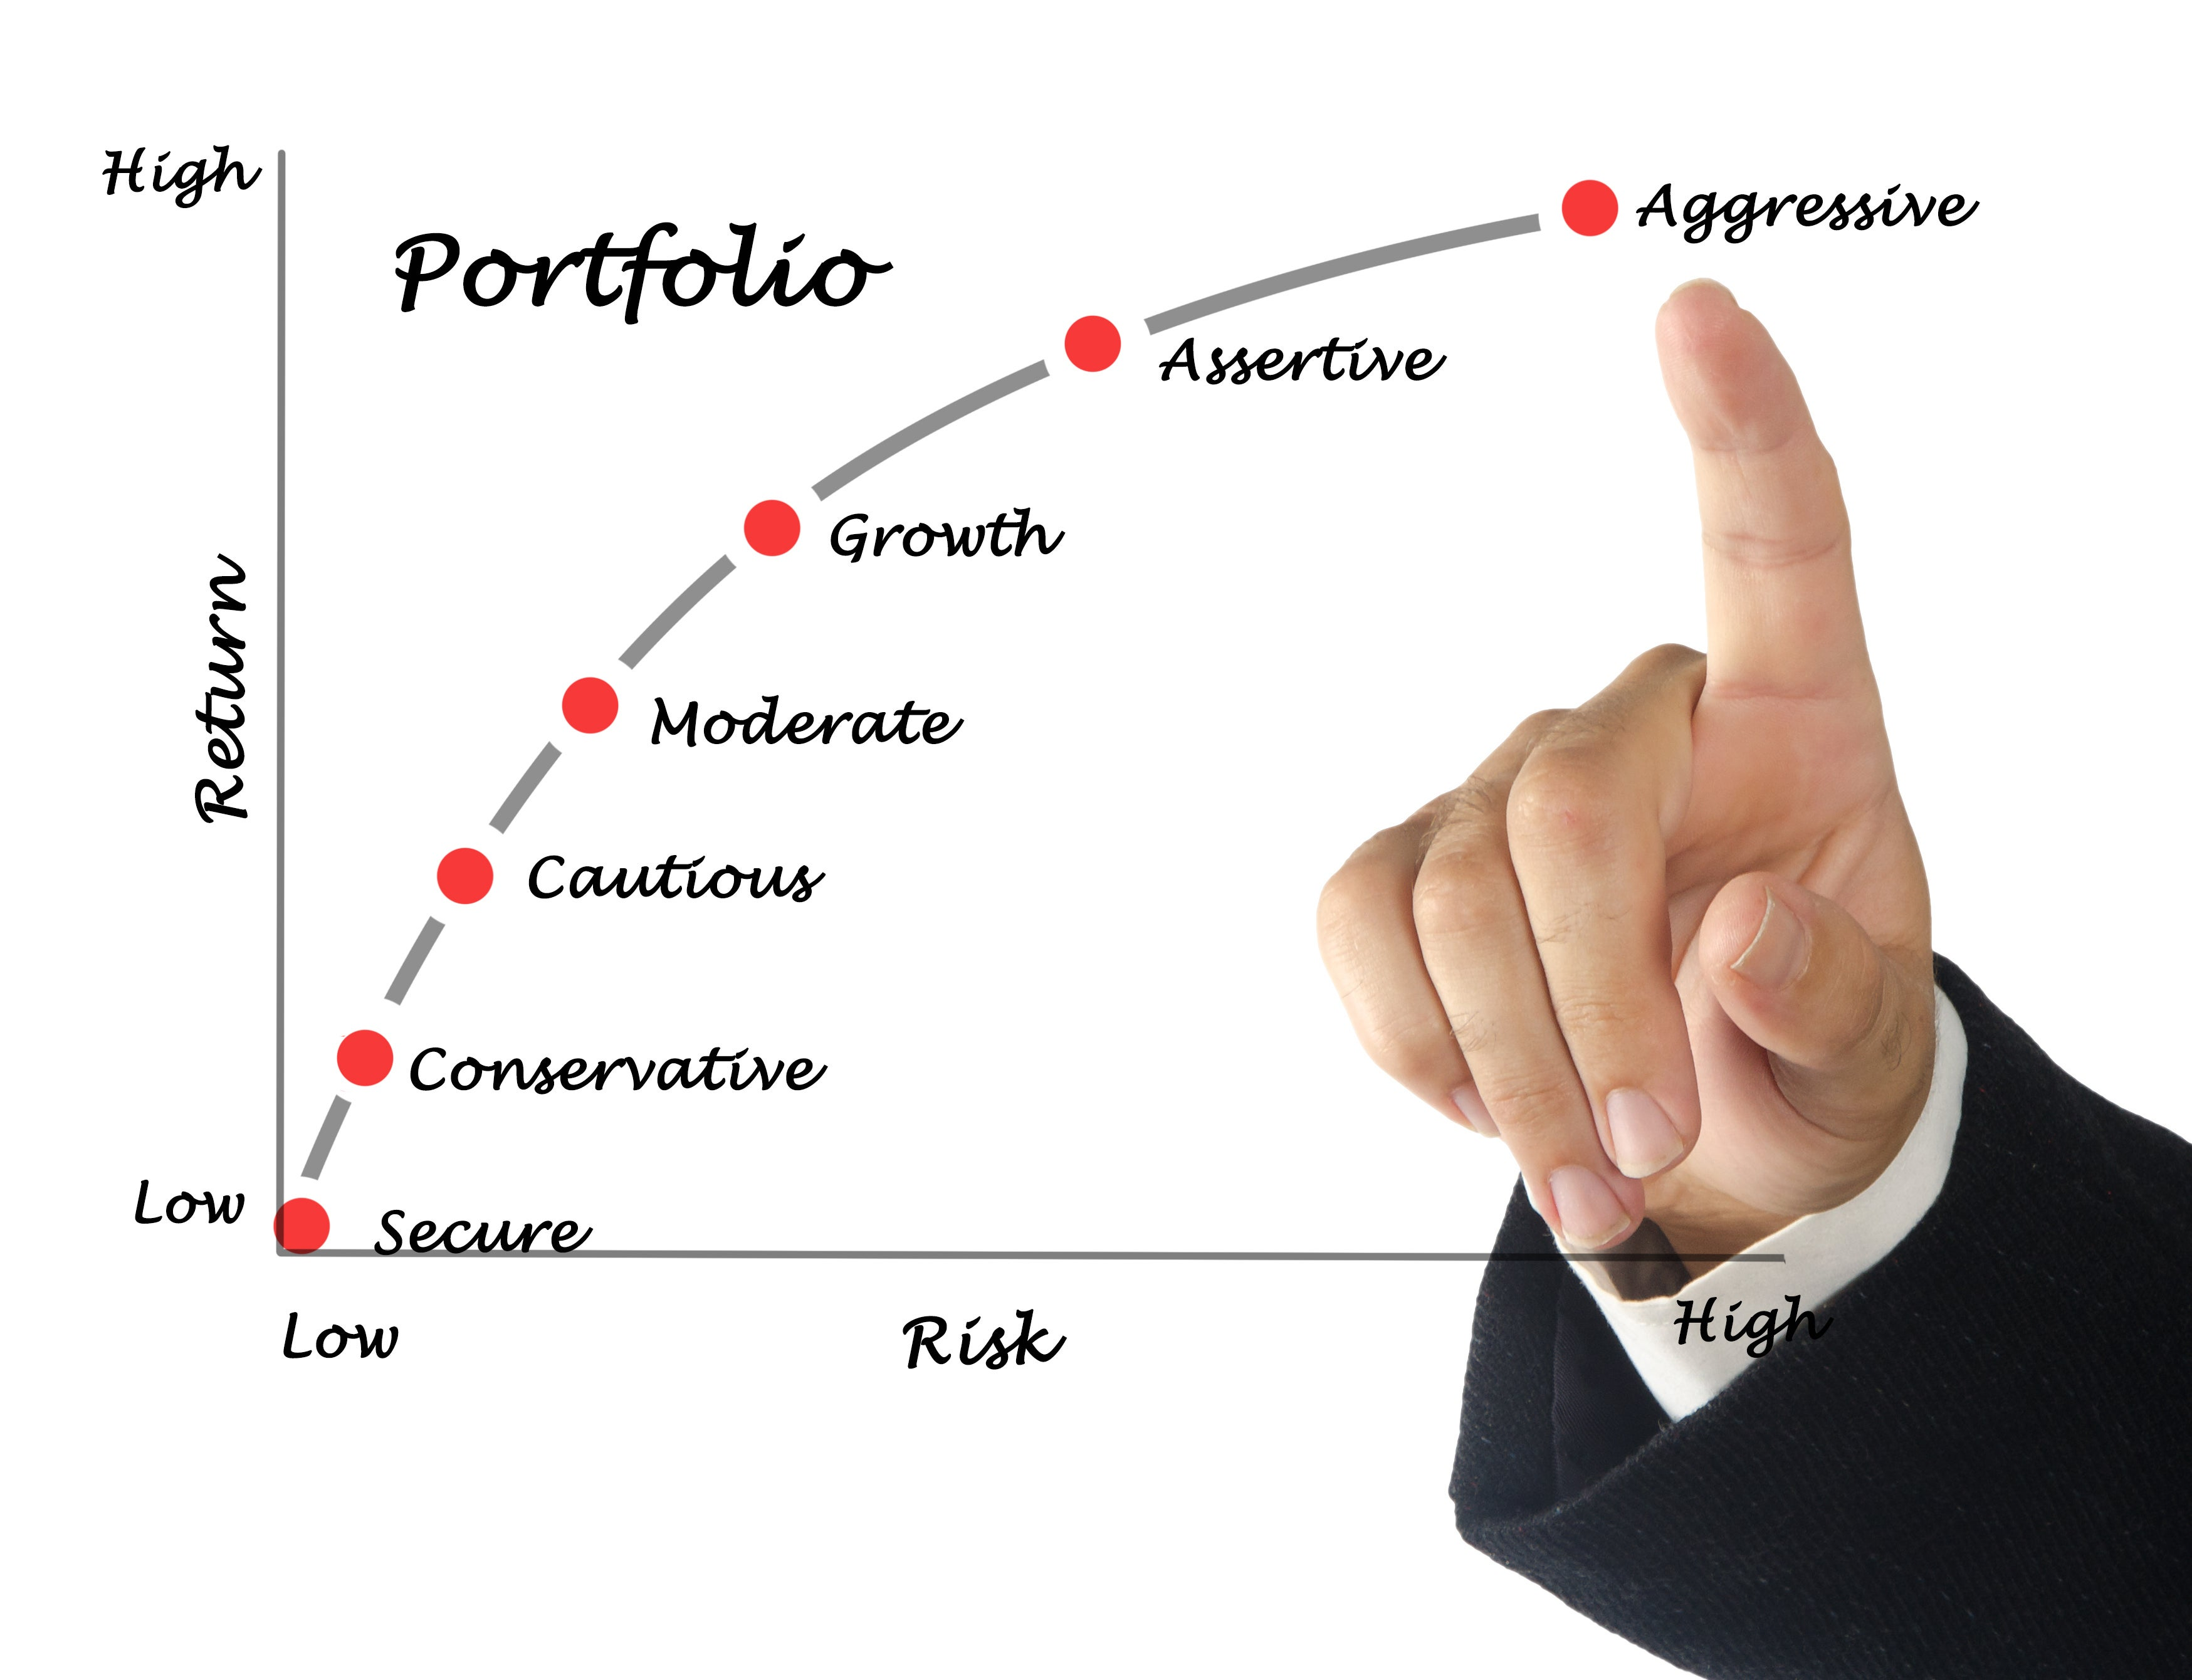 3 Top Small-Cap Biotech Stocks for Aggressive Investors ...